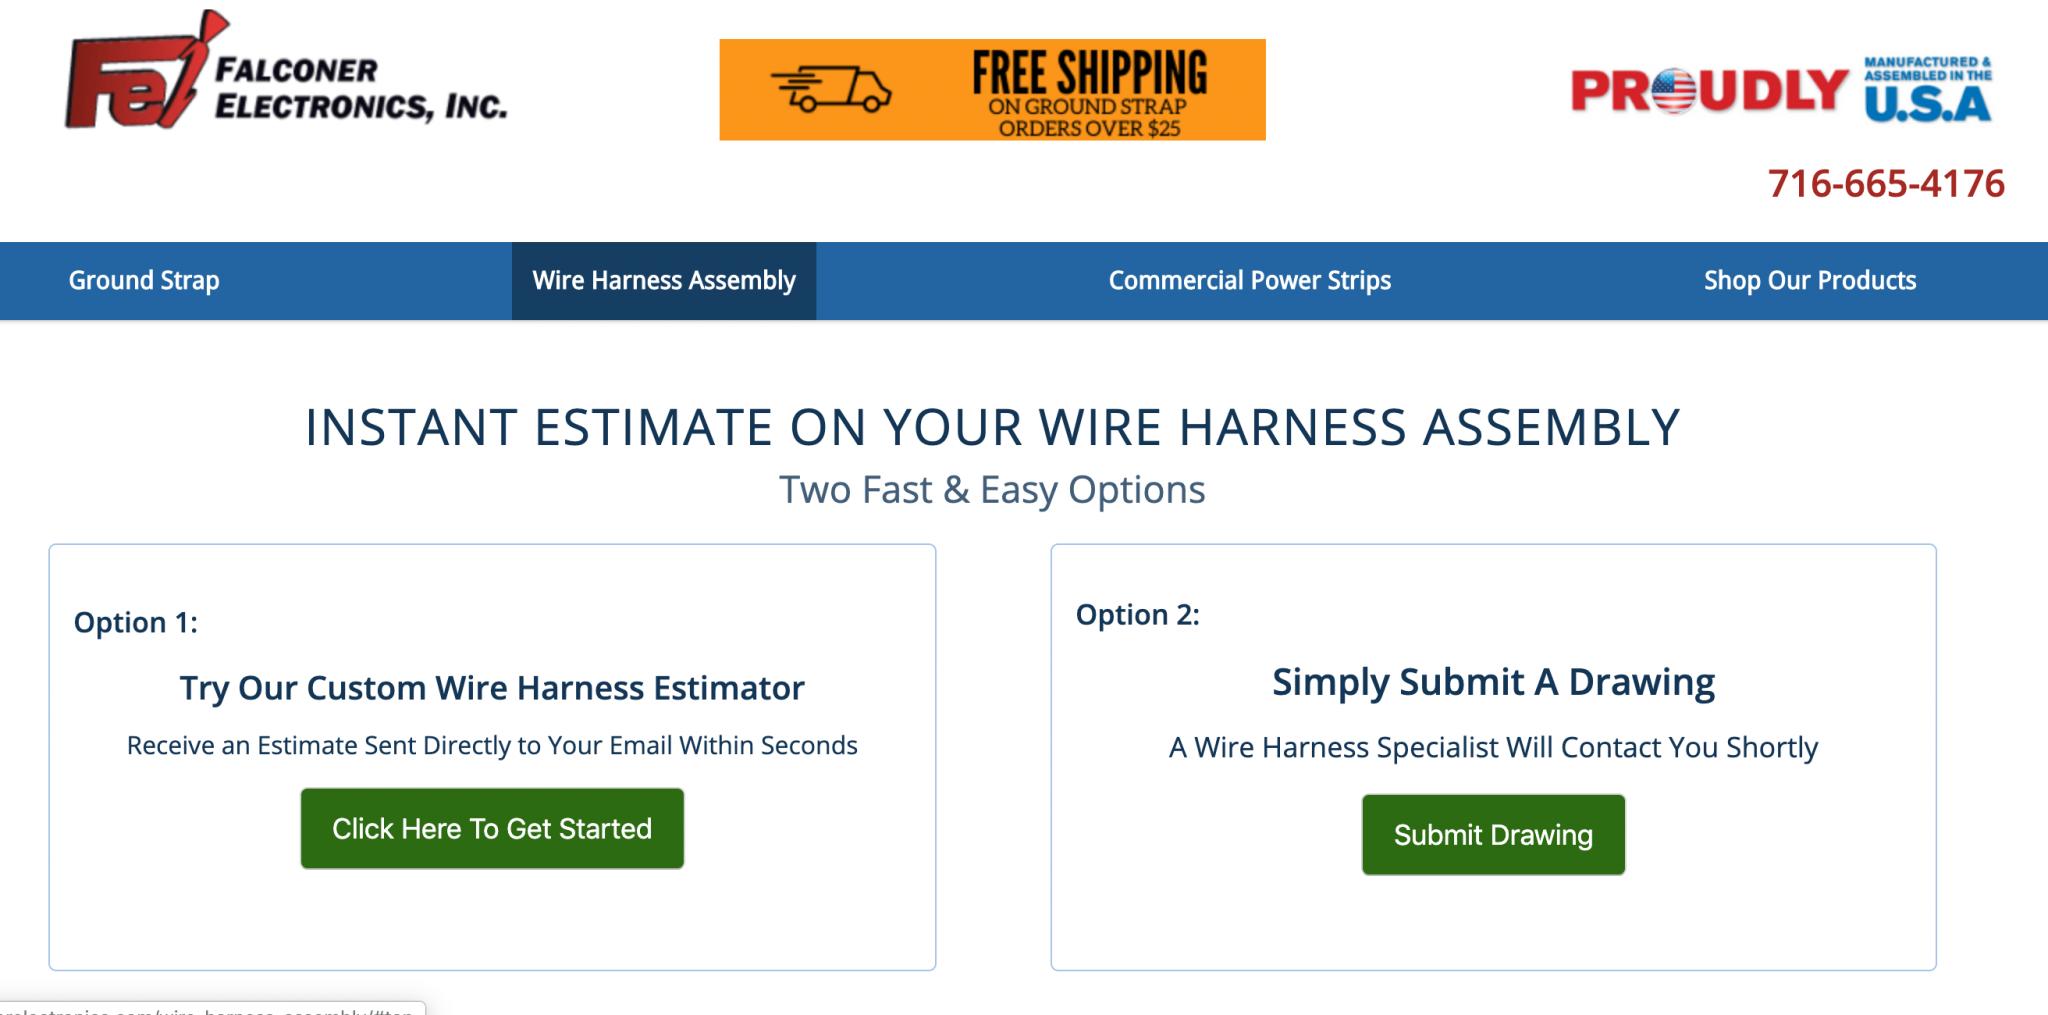 Wire Harness Estimator, Falconer Electronics Wire Harness Estimator: A Step by Step Guide